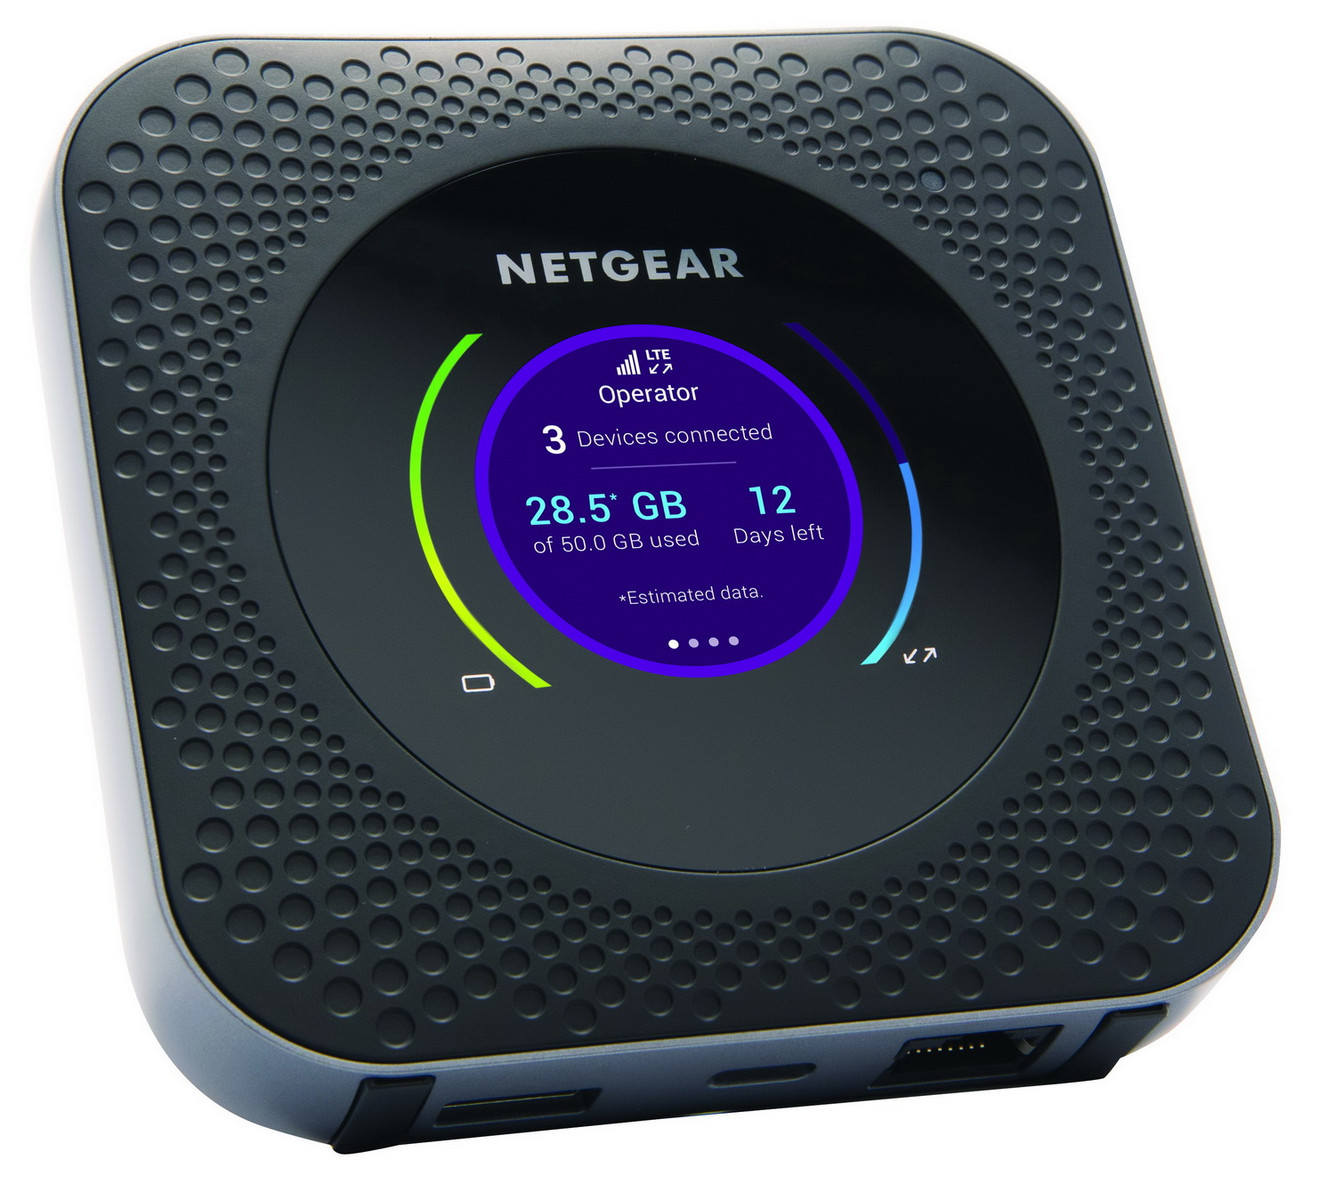 netgear nighthawk m1 mr1100 mobiler gbit lte hotspot. Black Bedroom Furniture Sets. Home Design Ideas